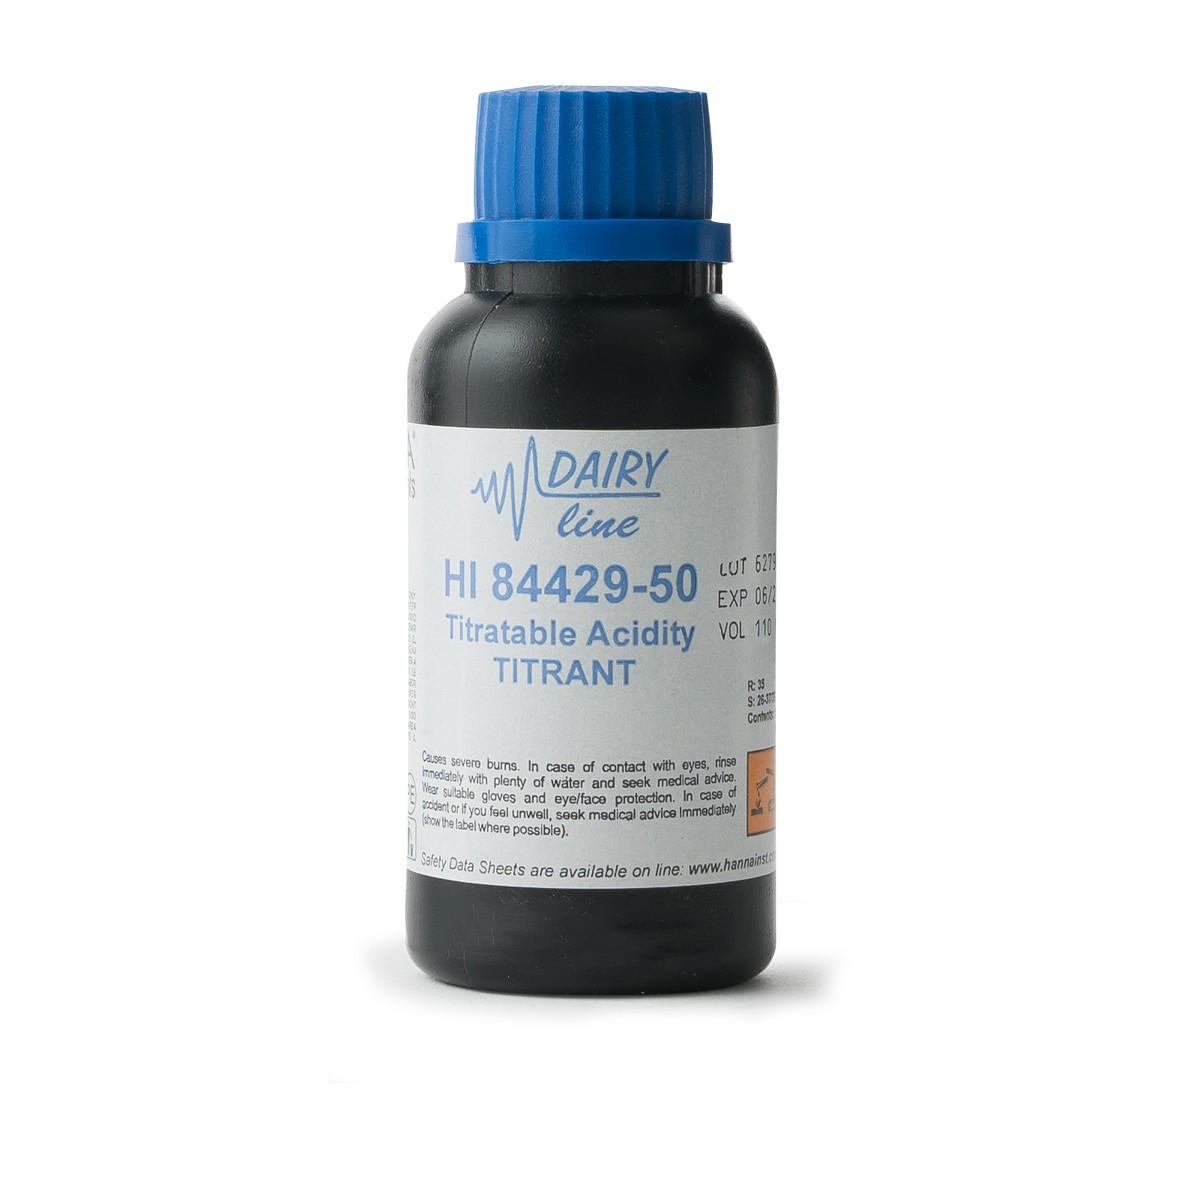 Titrant for Titratable Acidity - HI84429-50